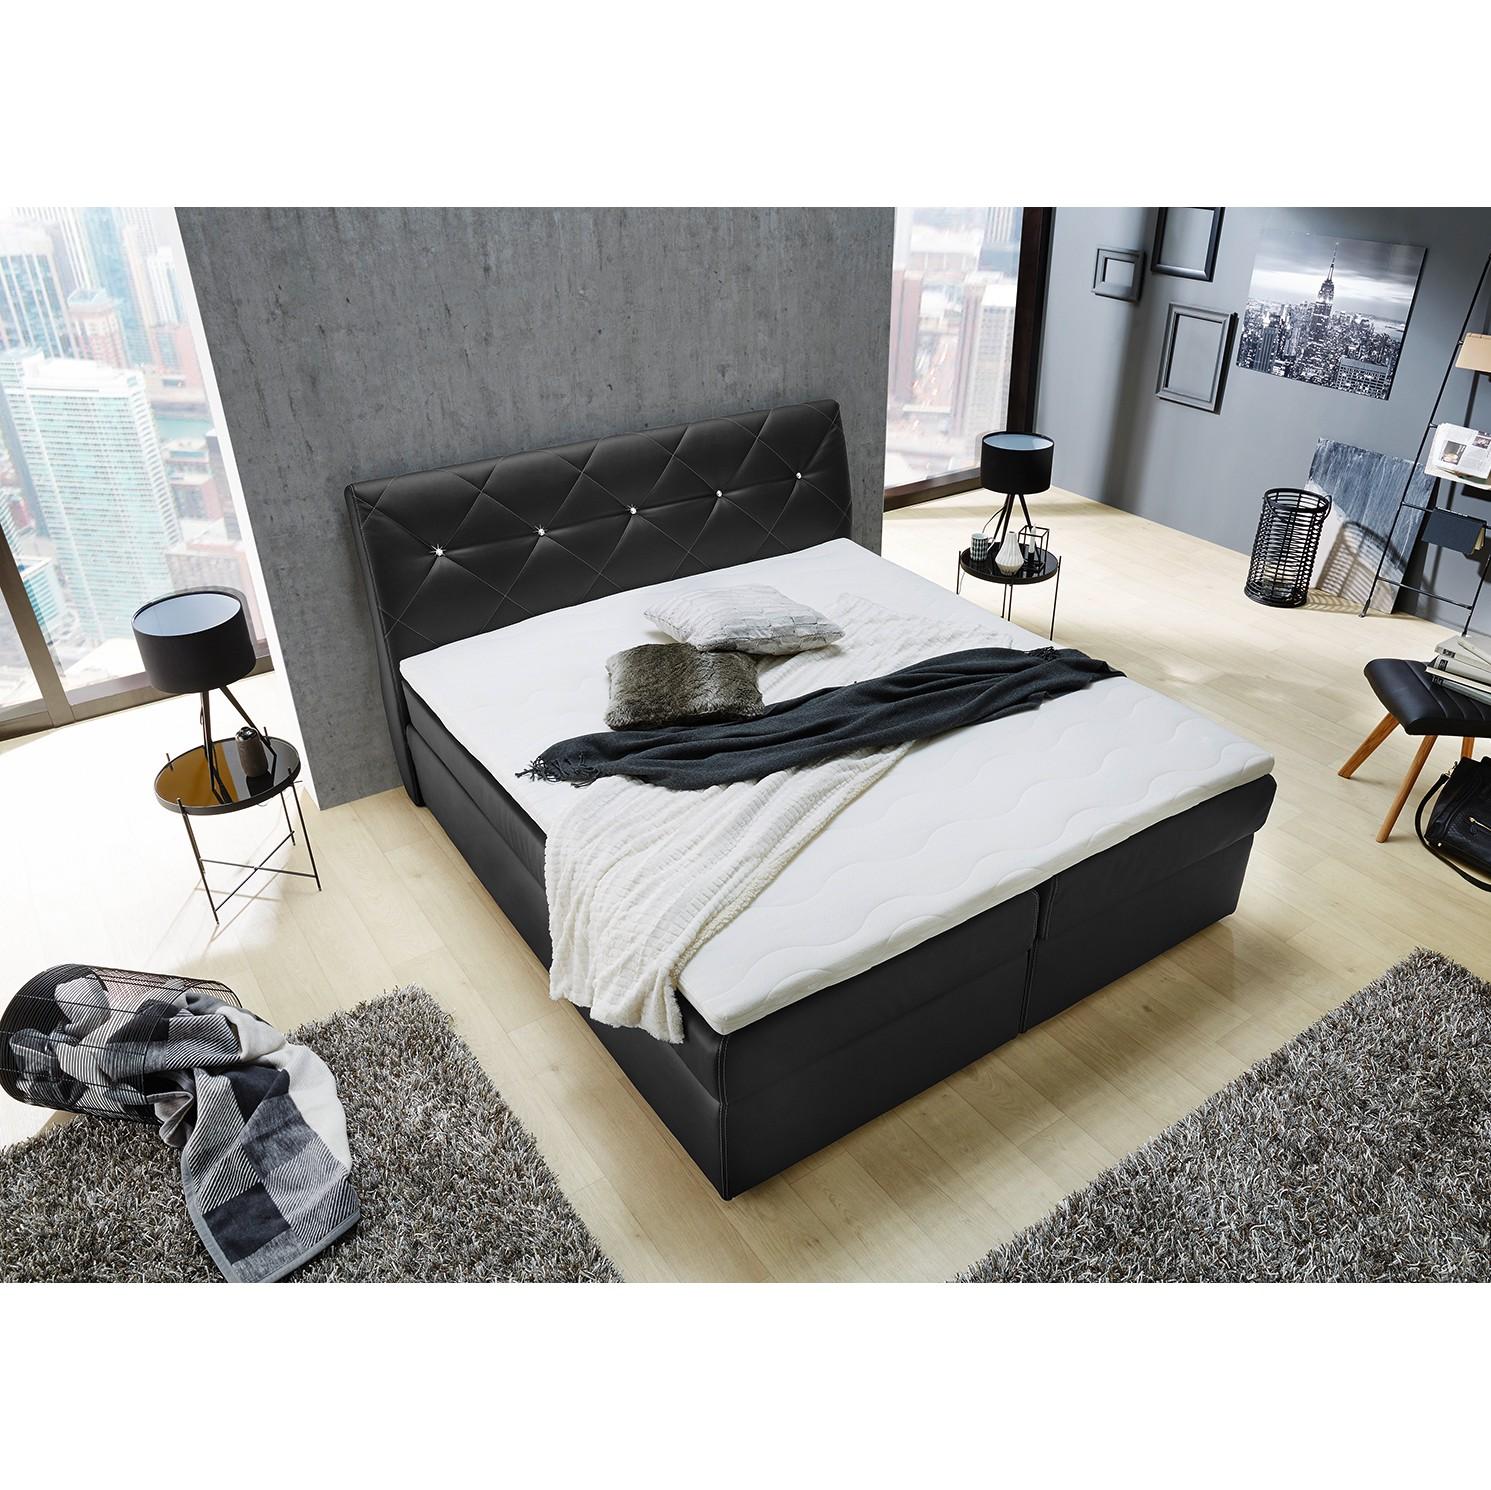 23 sparen boxspringbett laholm nur 999 99 cherry m bel home24. Black Bedroom Furniture Sets. Home Design Ideas